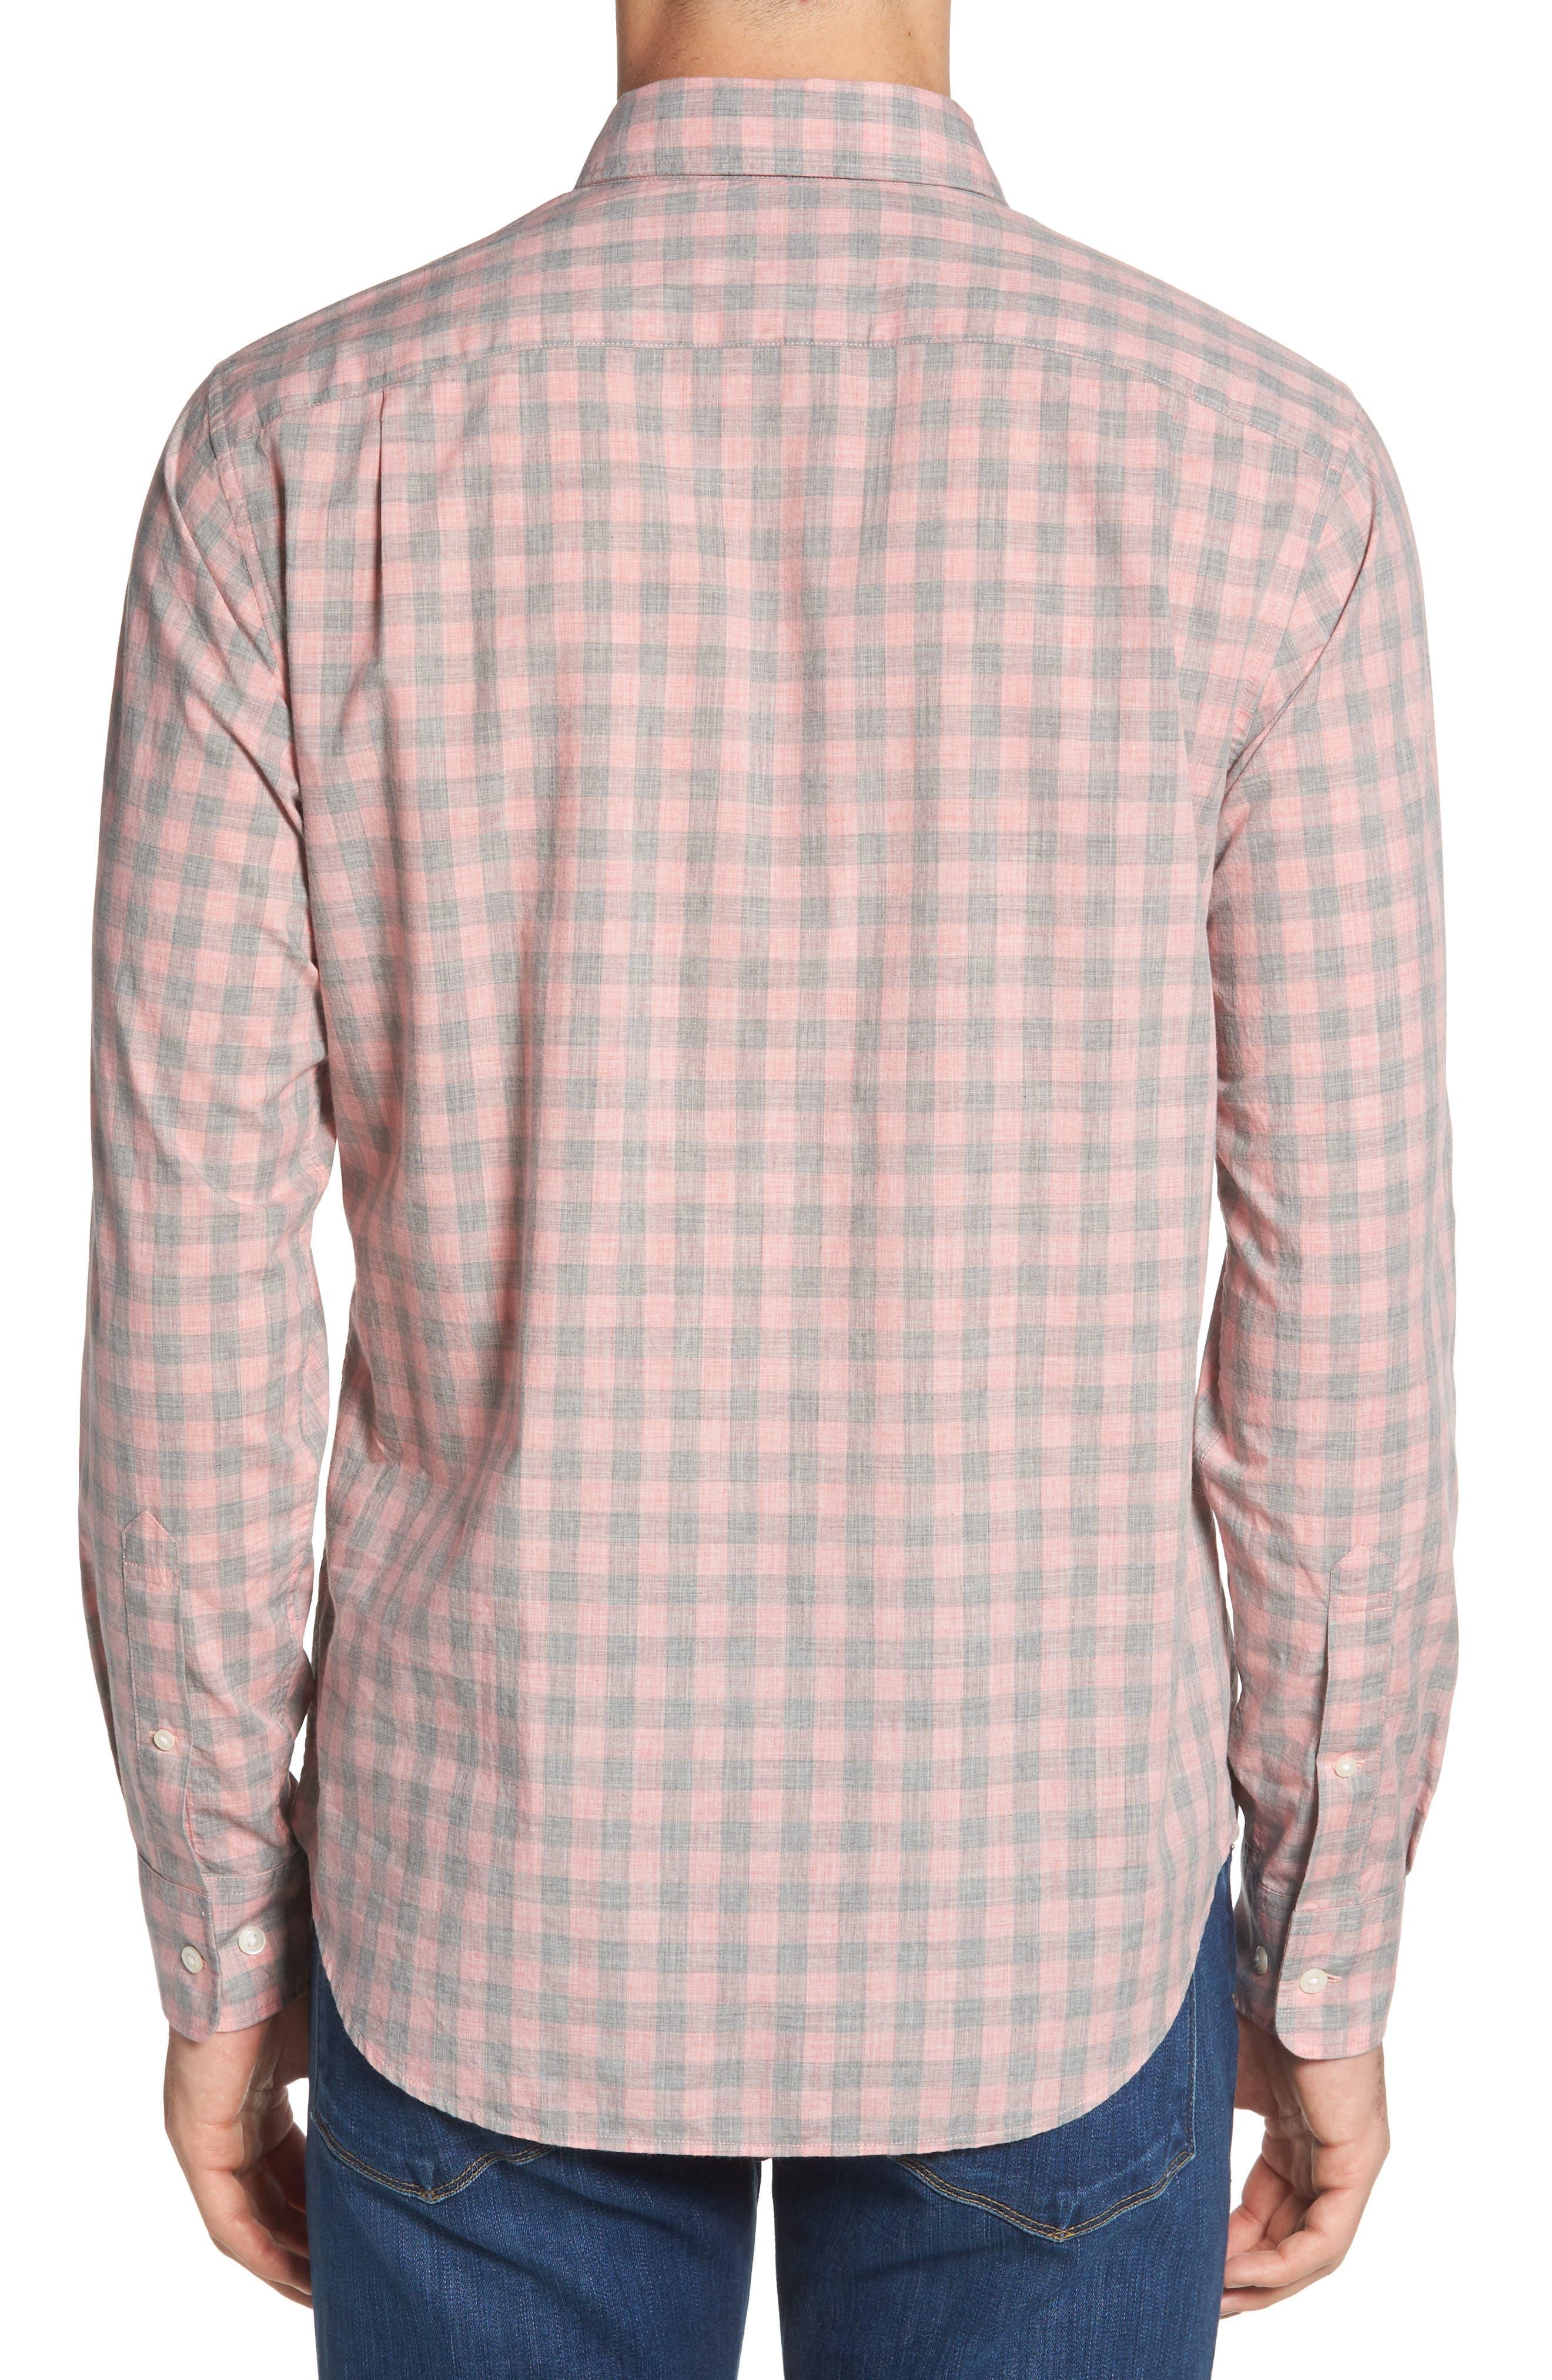 Summerweight Slim Fit Gingham Sport Shirt,                             Alternate thumbnail 4, color,                             Pine Gingham - Heather Rose